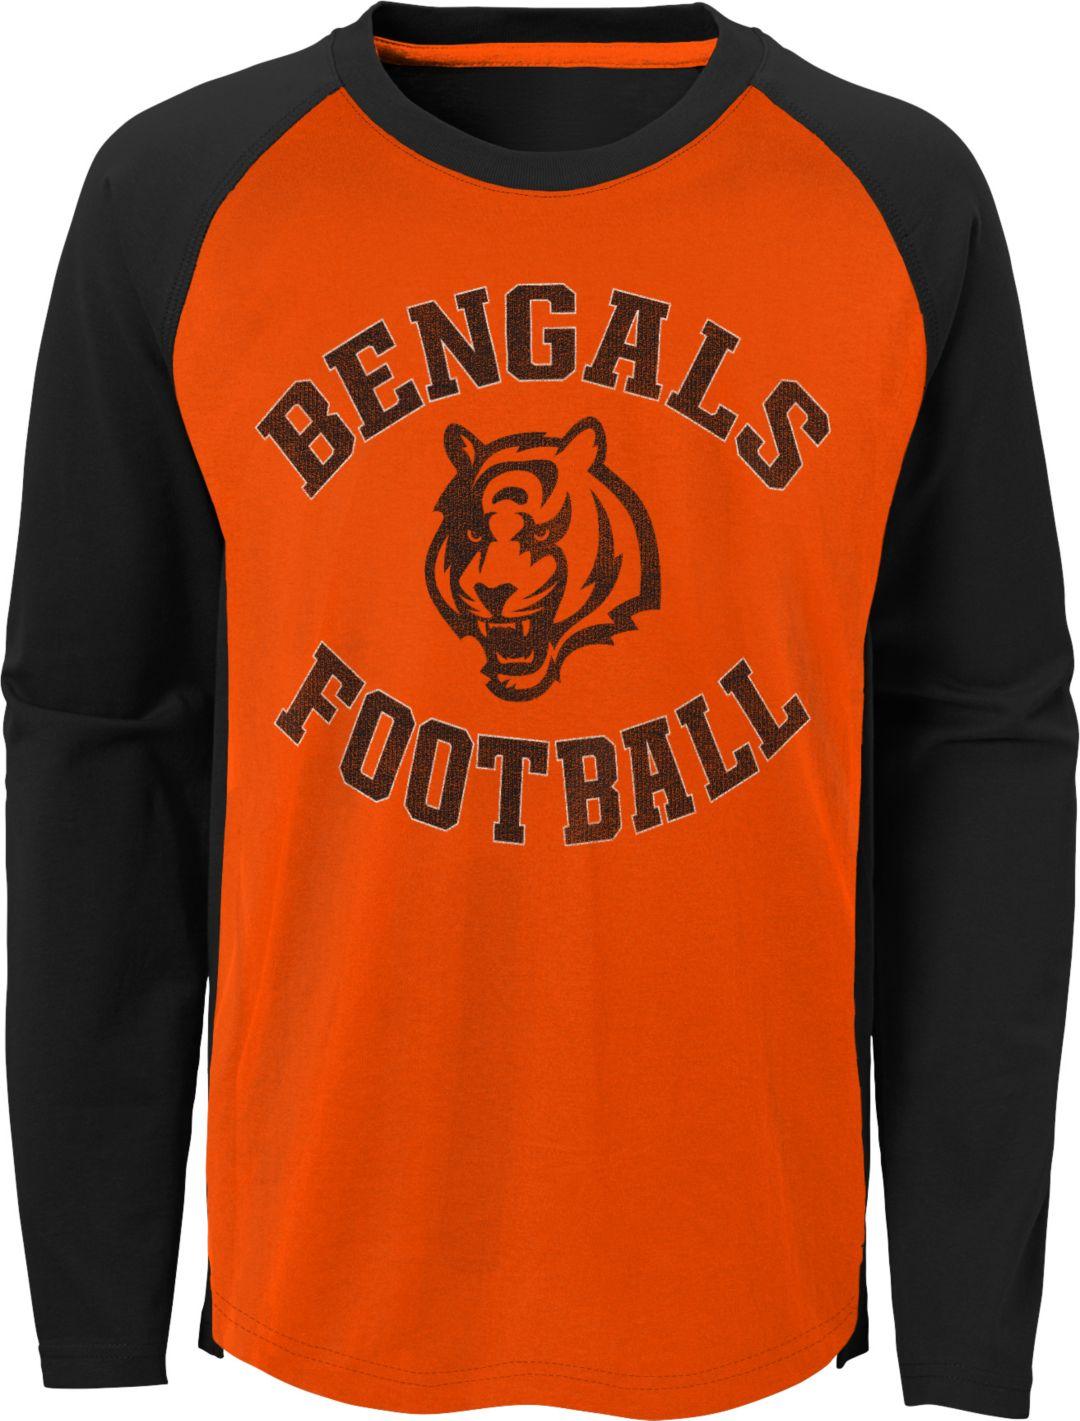 the latest fb206 32791 NFL Team Apparel Youth Cincinnati Bengals Air Raid Long Sleeve Black Shirt